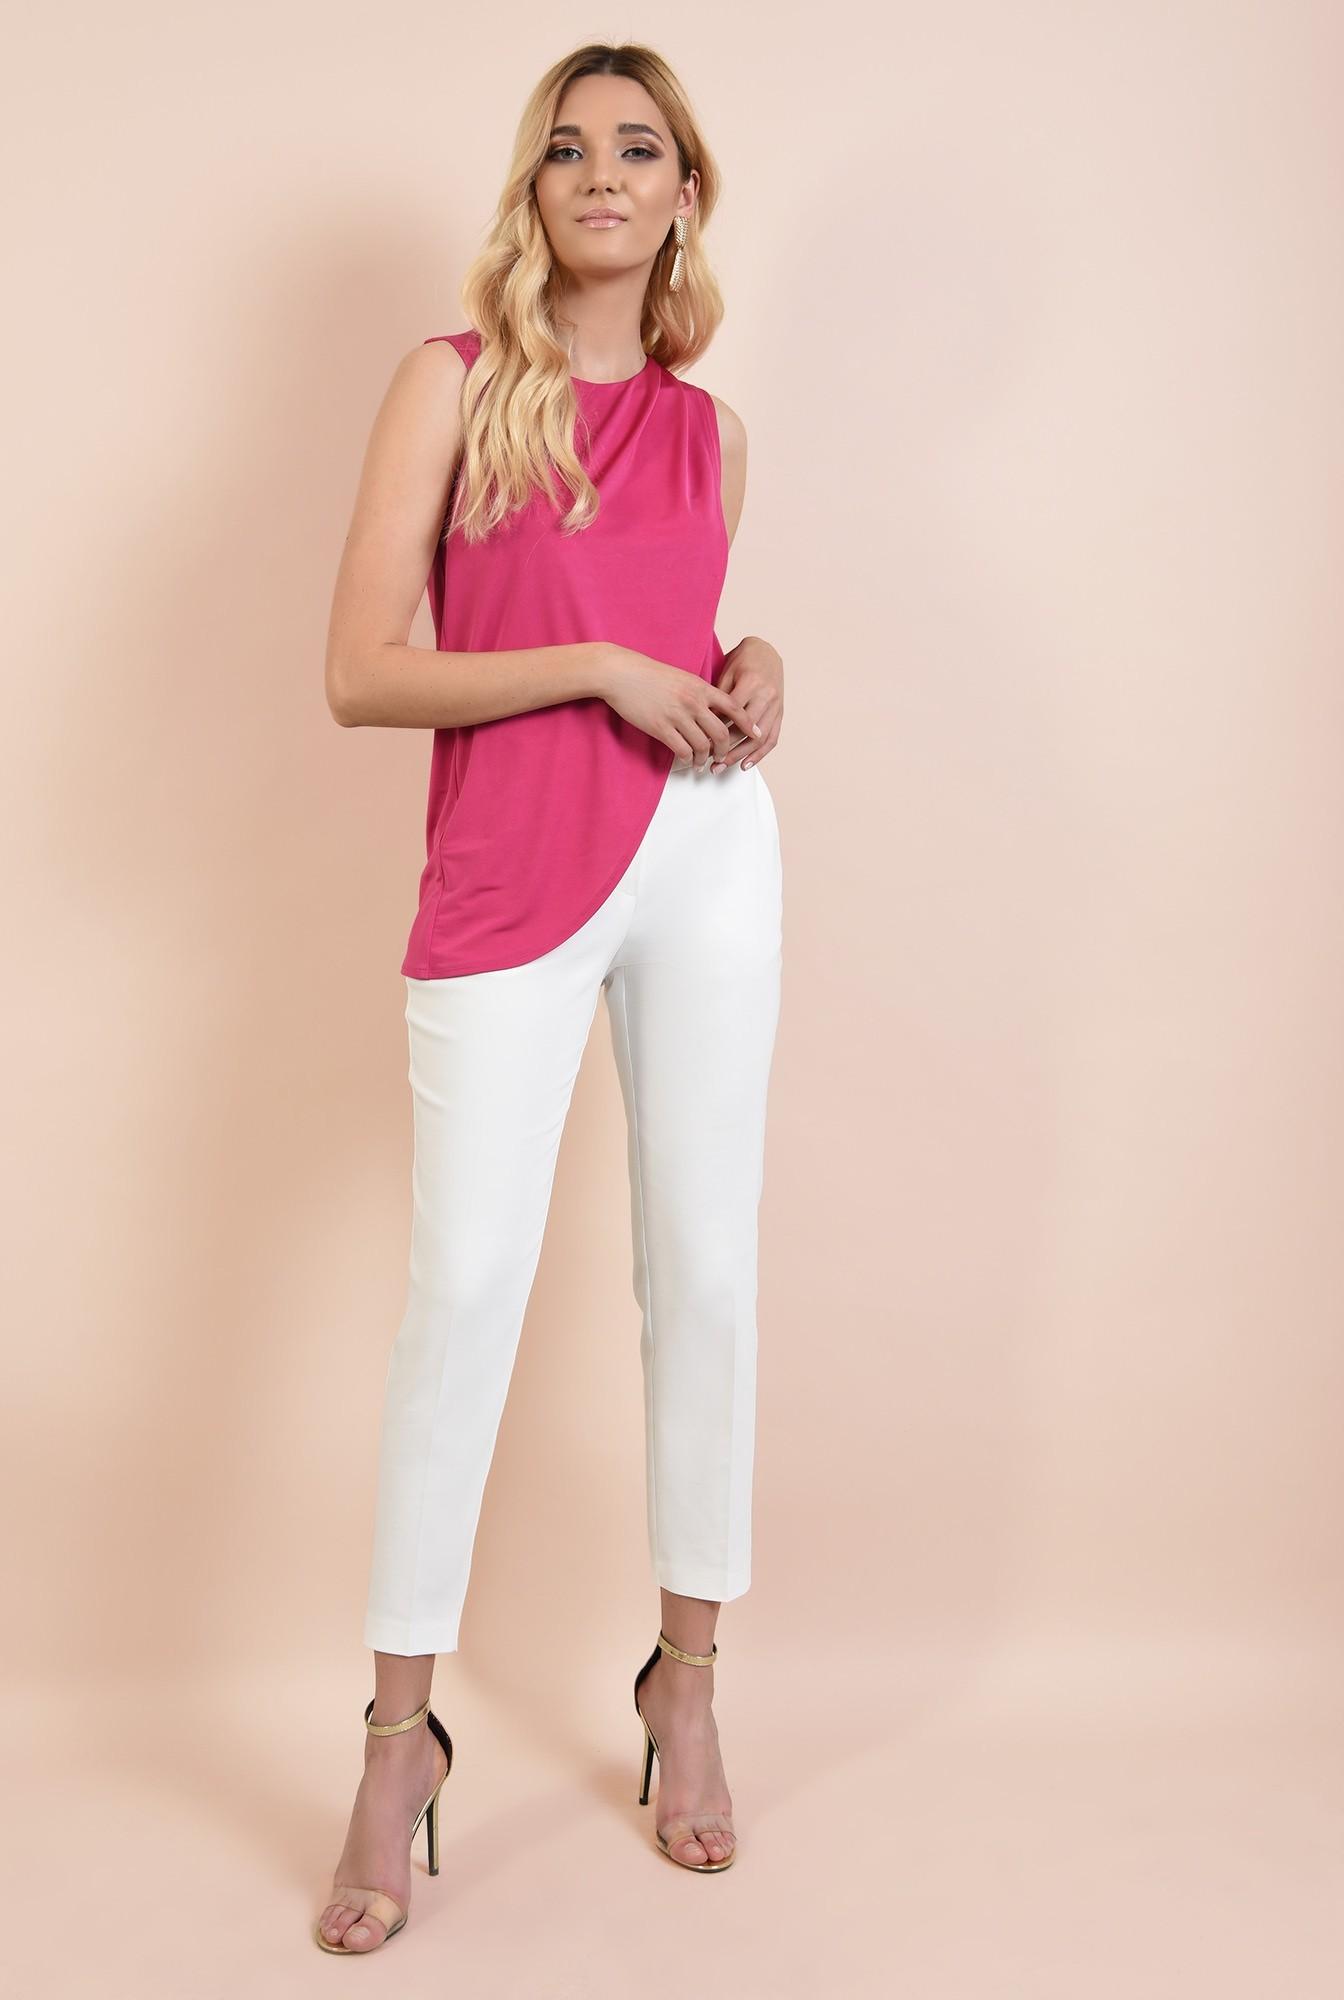 3 - bluza roz, cu fronseuri la umeri, croi parte peste parte, asimetrica